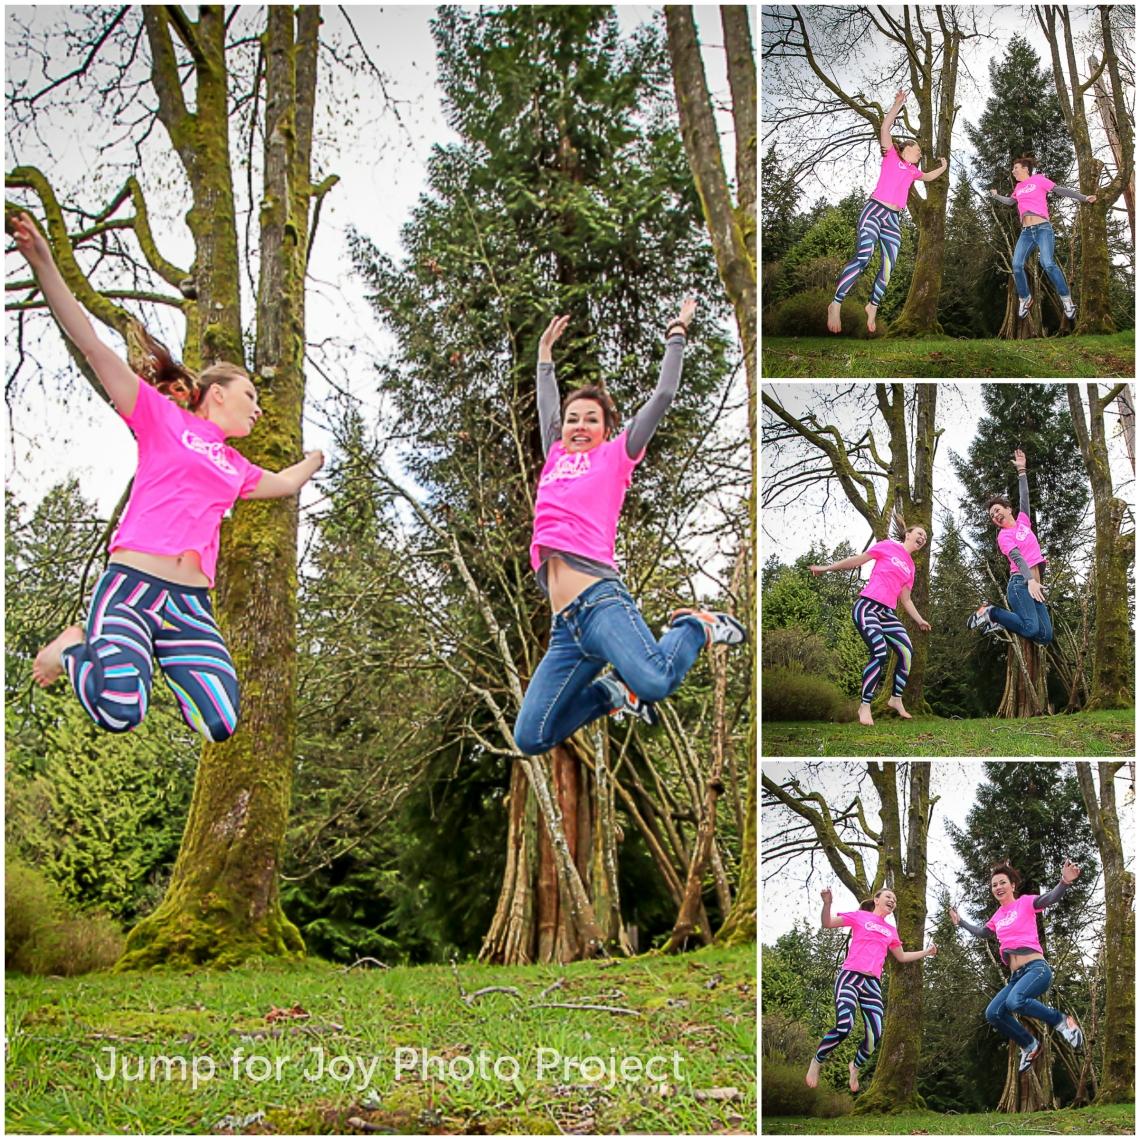 Selfie photo by Eyoälha www.jumpforjoyphotoproject.com